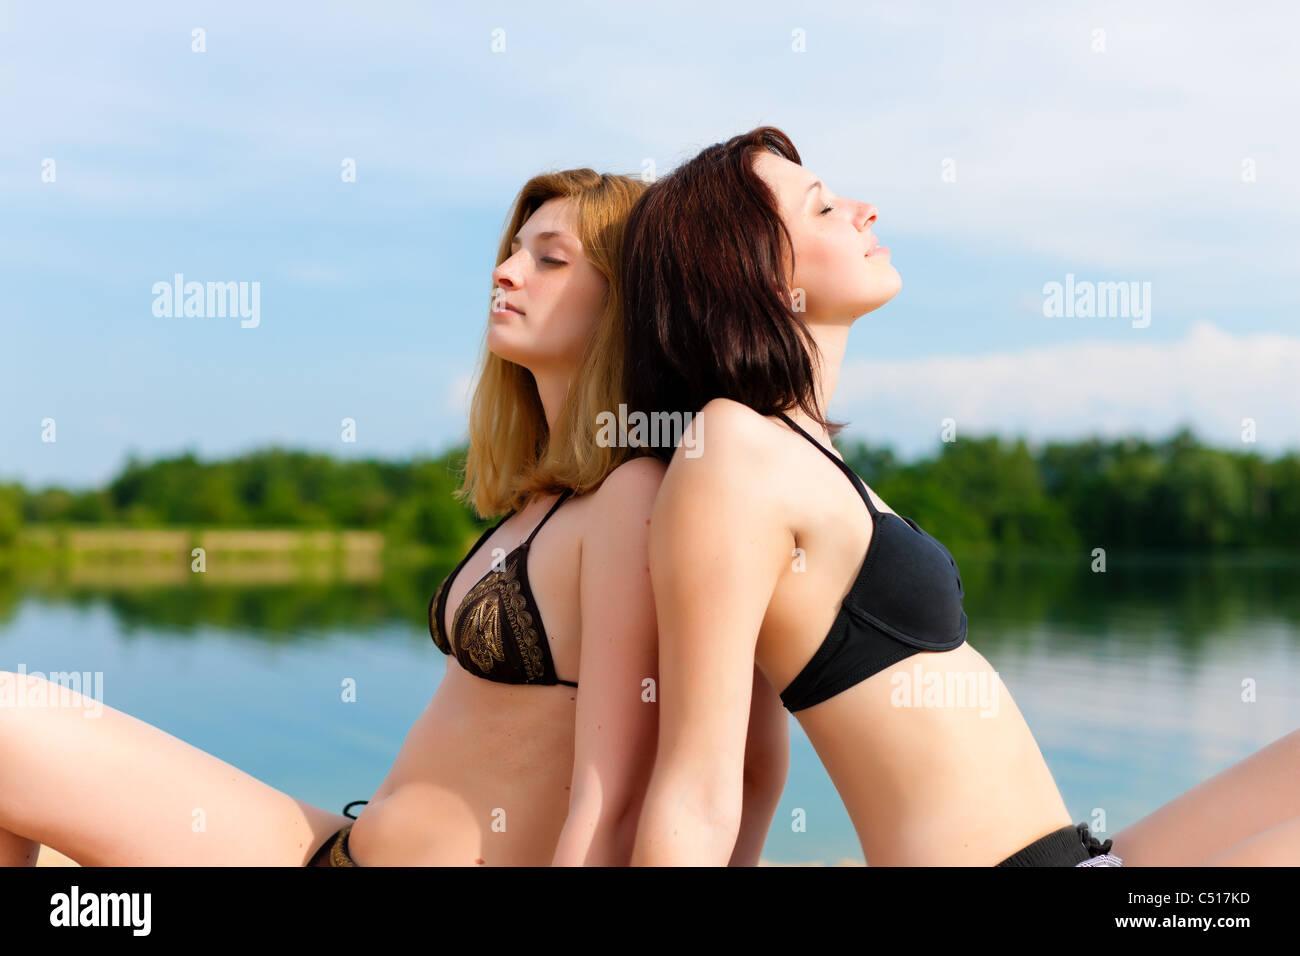 Two happy women having fun in summer at lake; they wearing swimwear - Stock Image